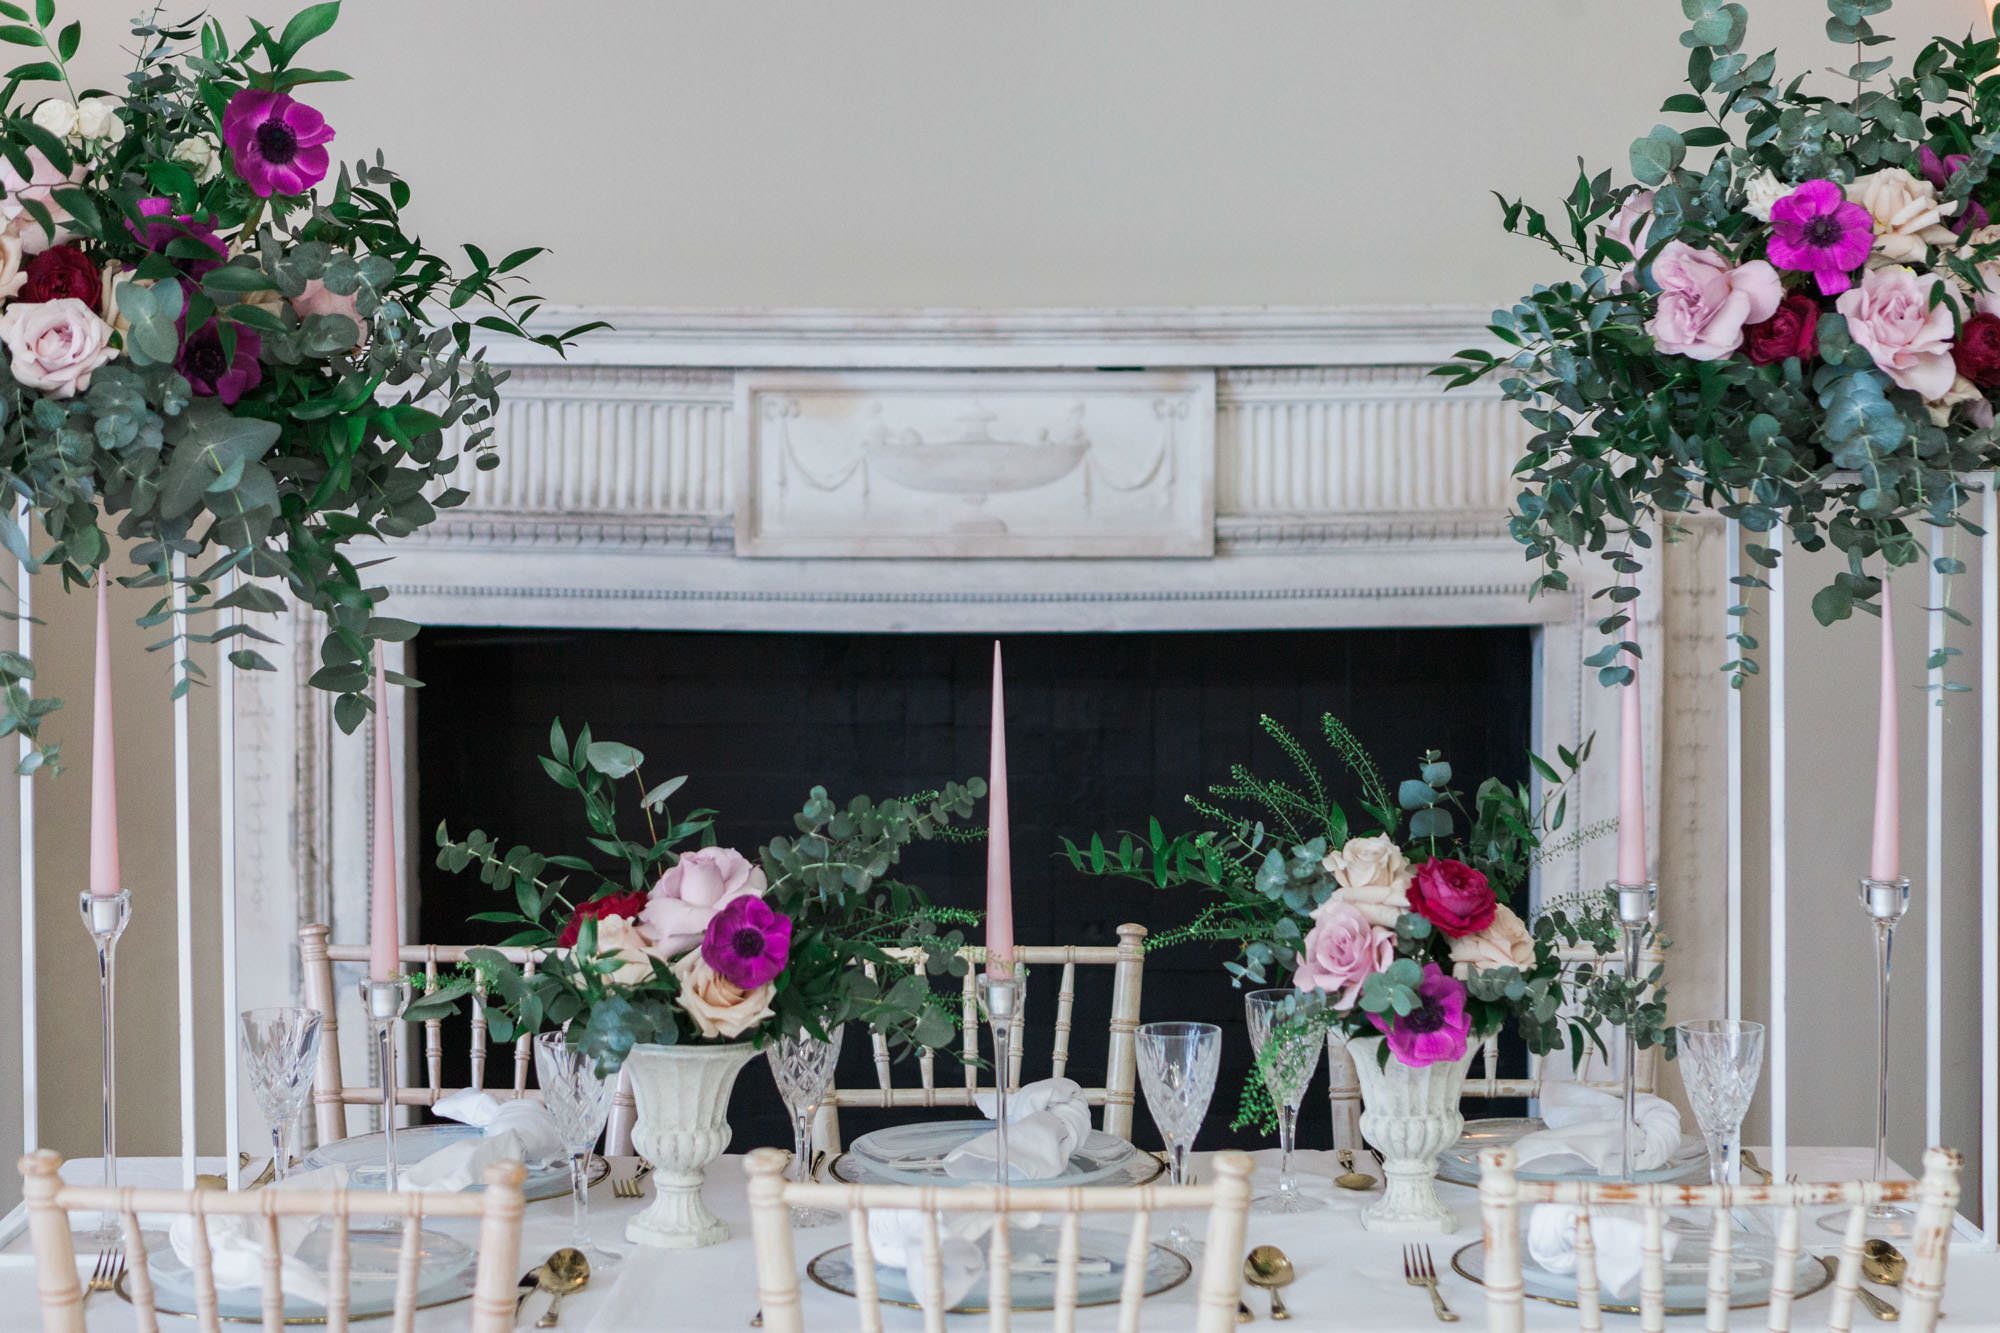 AVE creations, creative weddings, diverse weddings, inclusive weddings, london multicultural weddings, london wedding planner, london wedding stylist, multicultural weddings